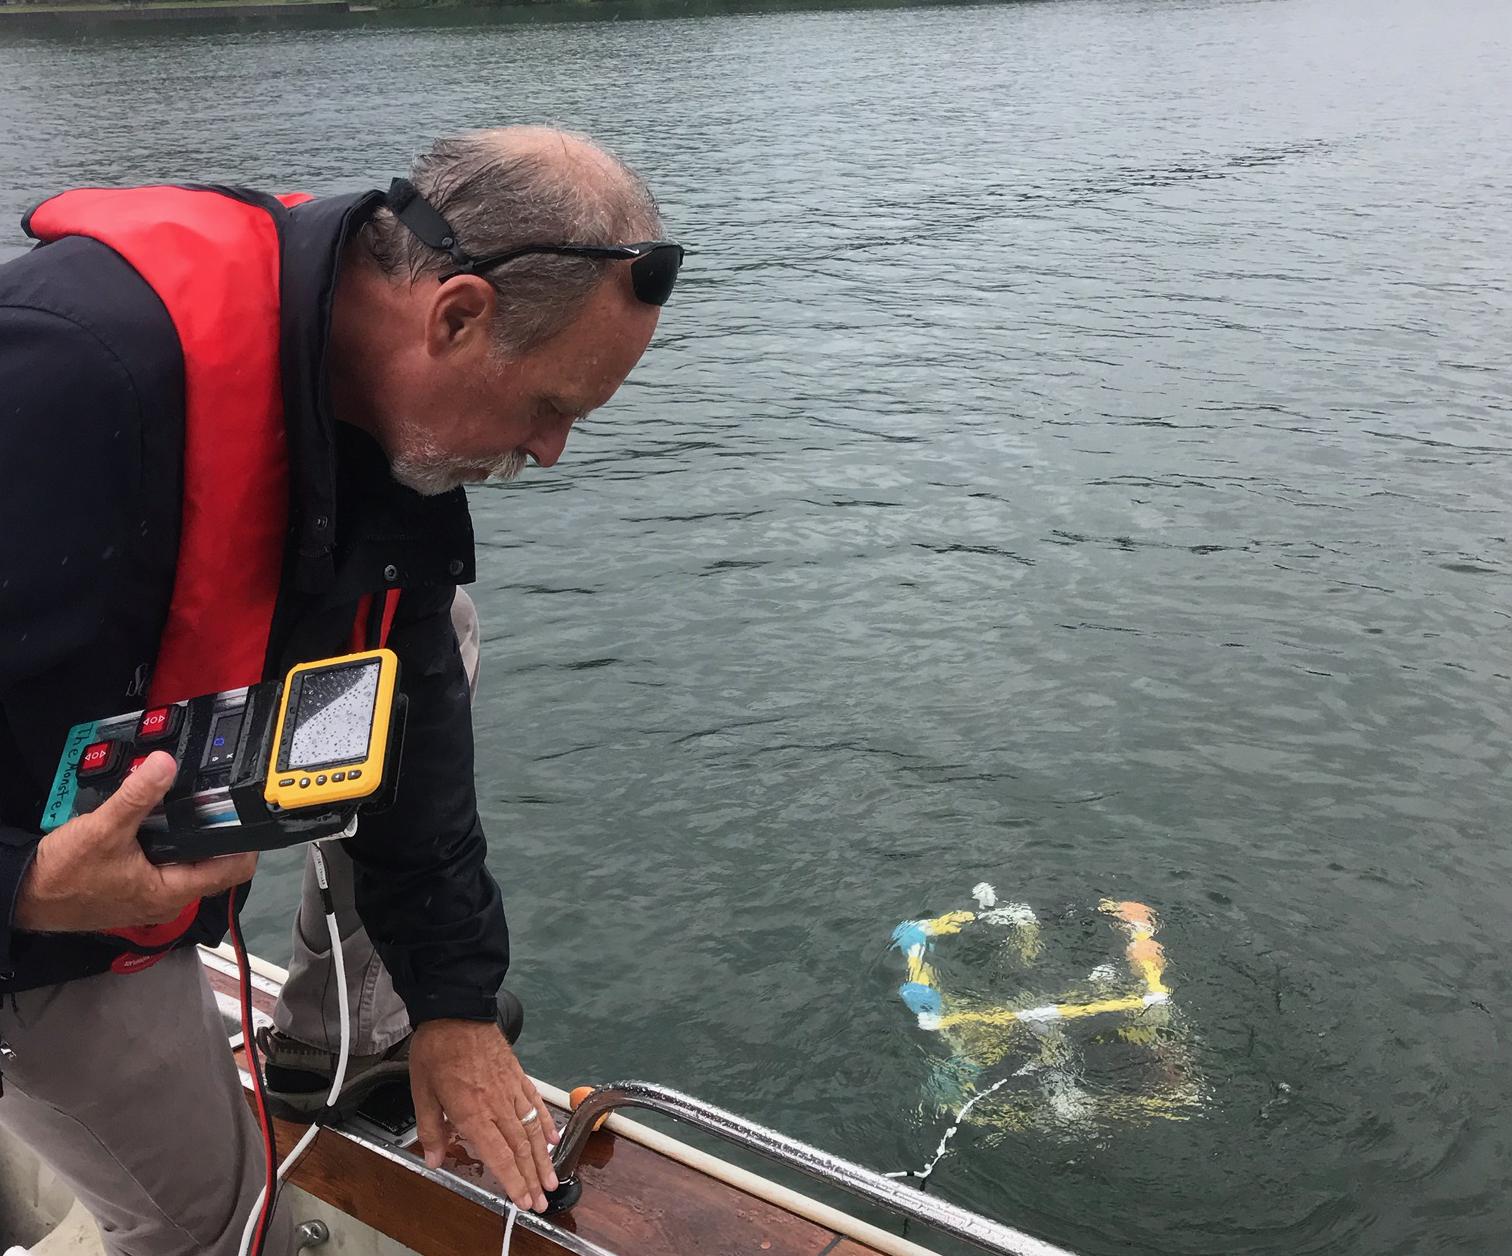 David Boughton participating in survey of underwater fish habitat structures